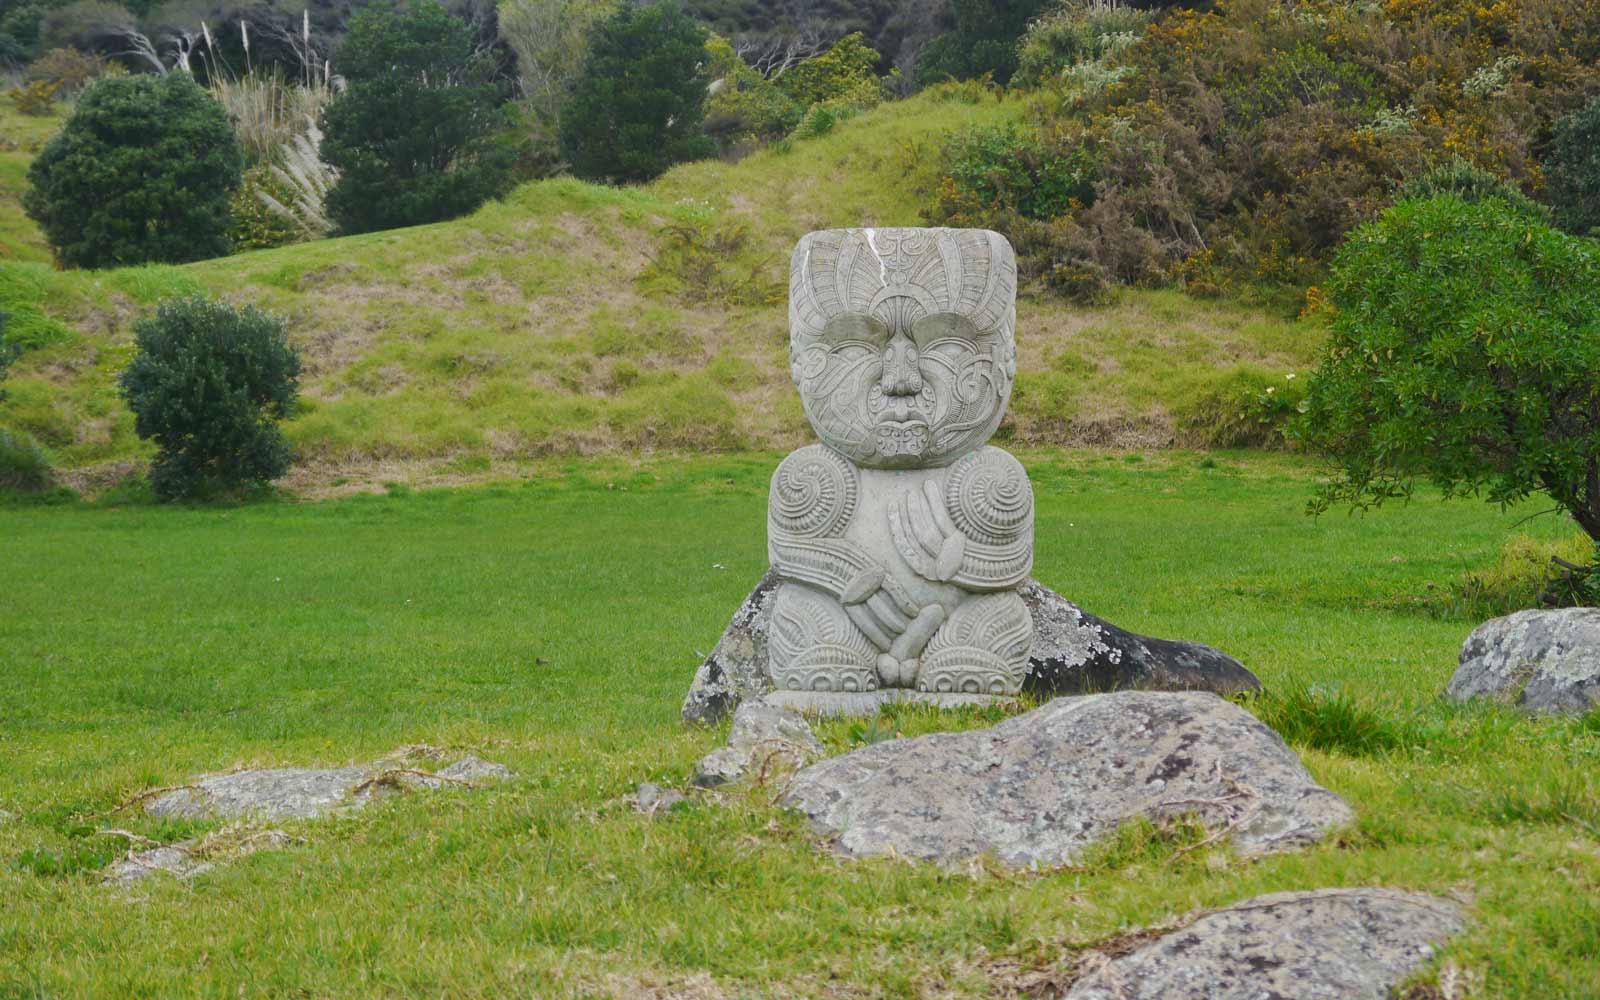 Steinfigur in Neuseeland